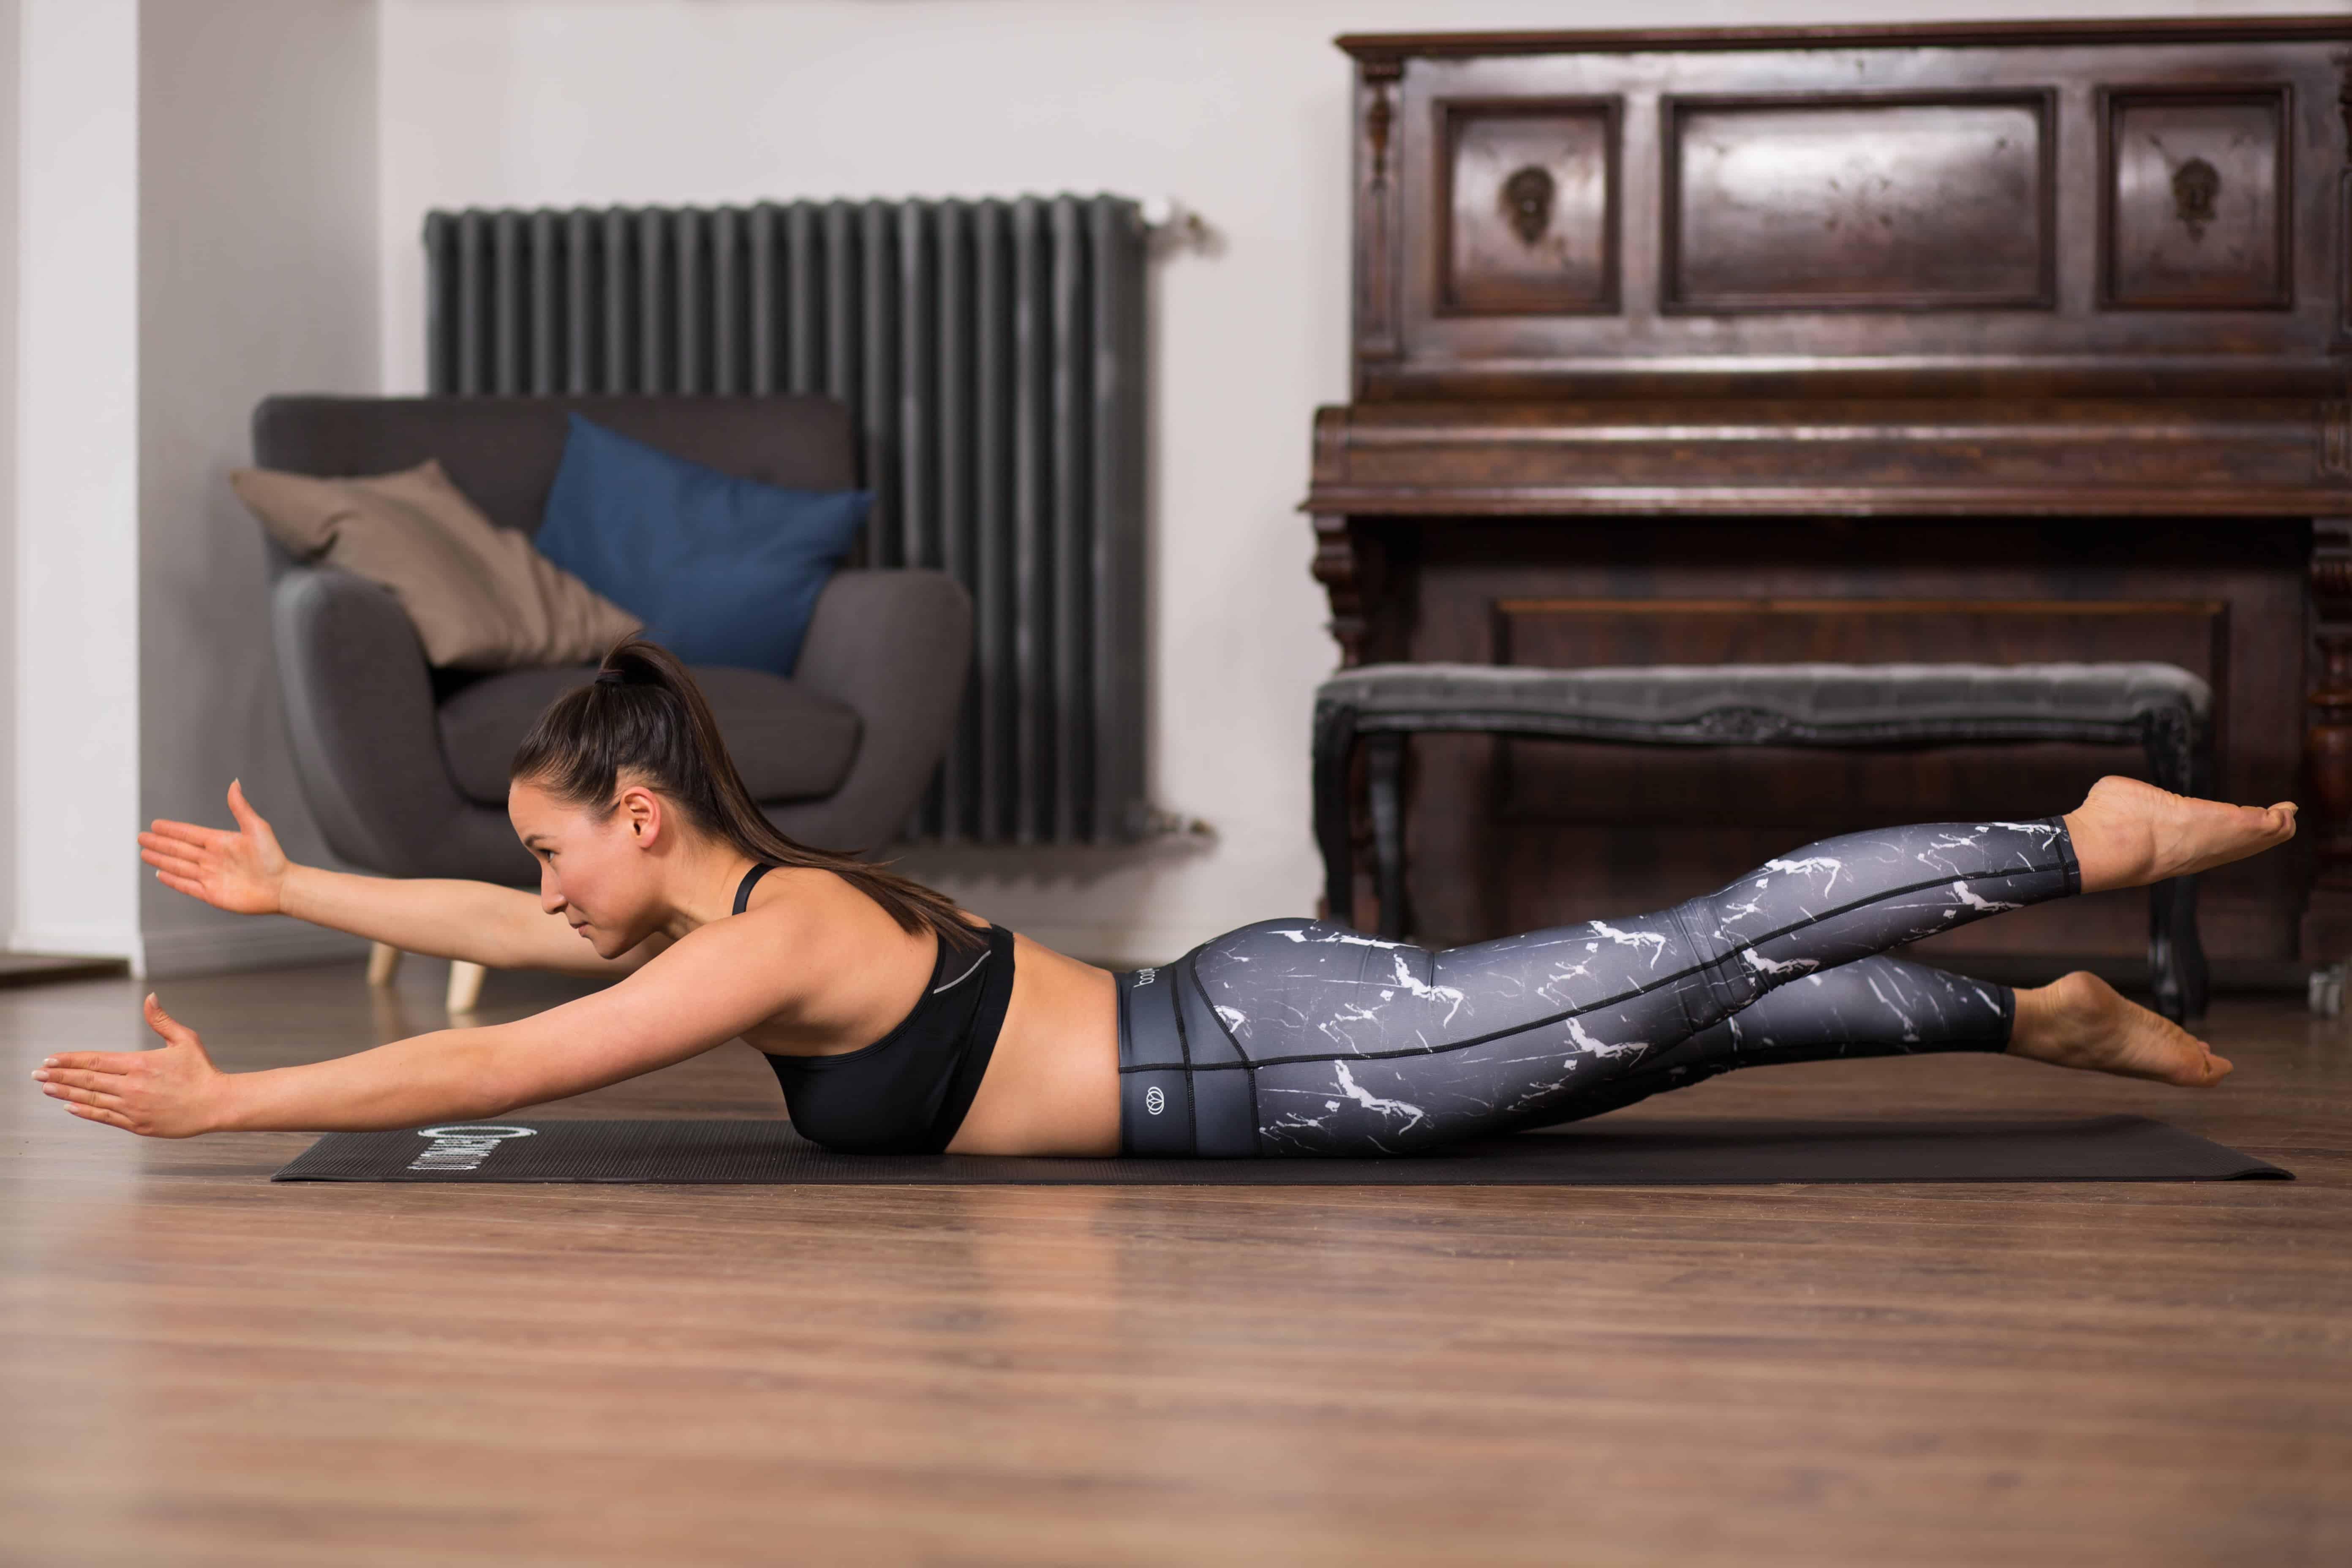 Frau macht Übung Swimming aus dem Pilates